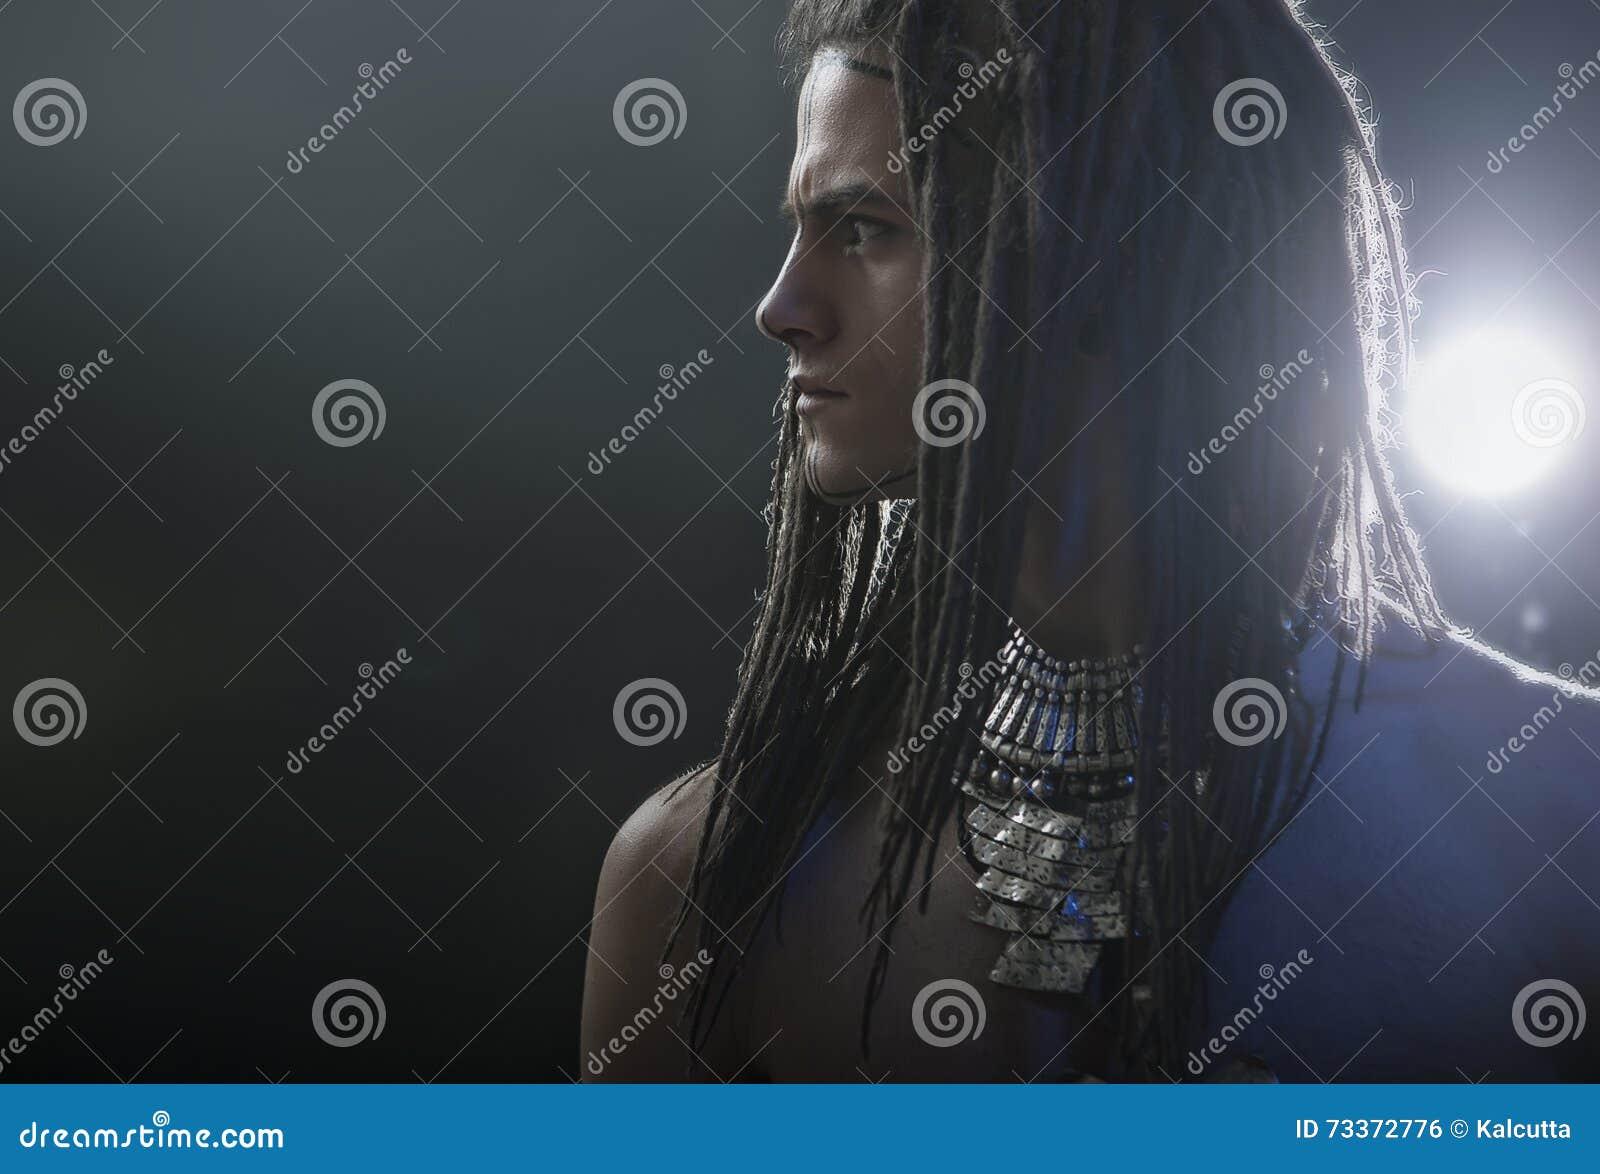 Man portrait s young Μοντέρνος όμορφος προκλητικός τύπος με Dreadlocks